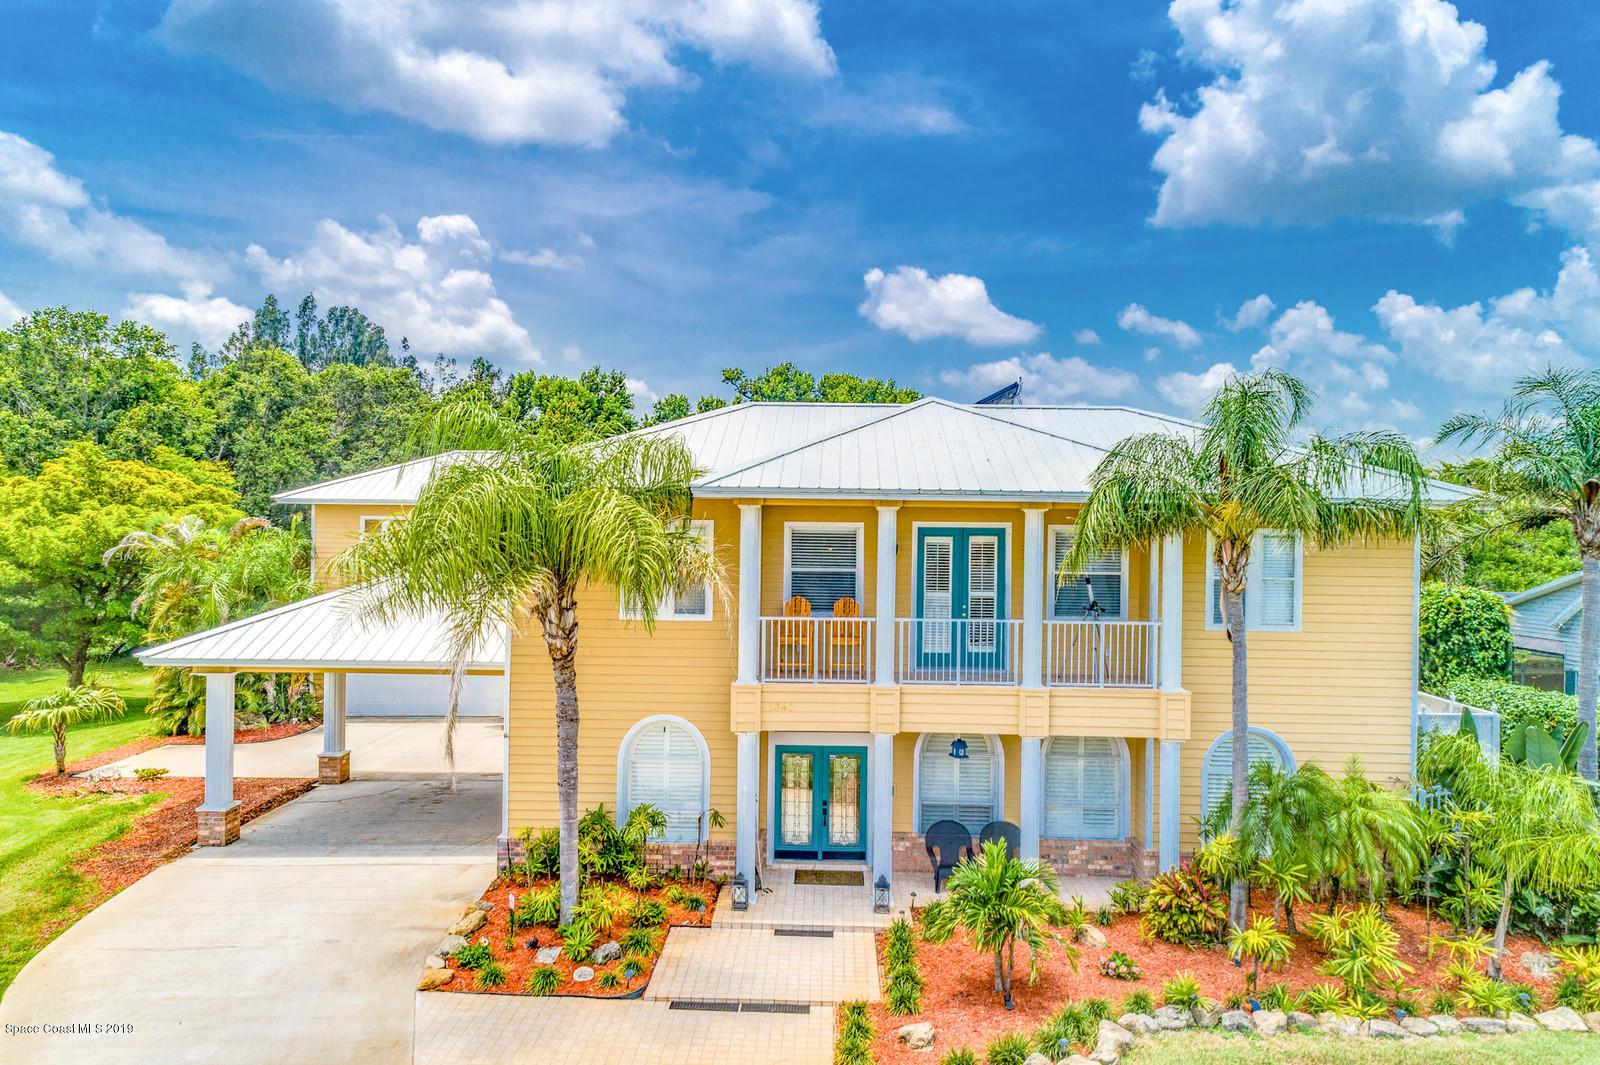 Single Family Homes for Sale at 2340 Stonebridge Rockledge, Florida 32955 United States